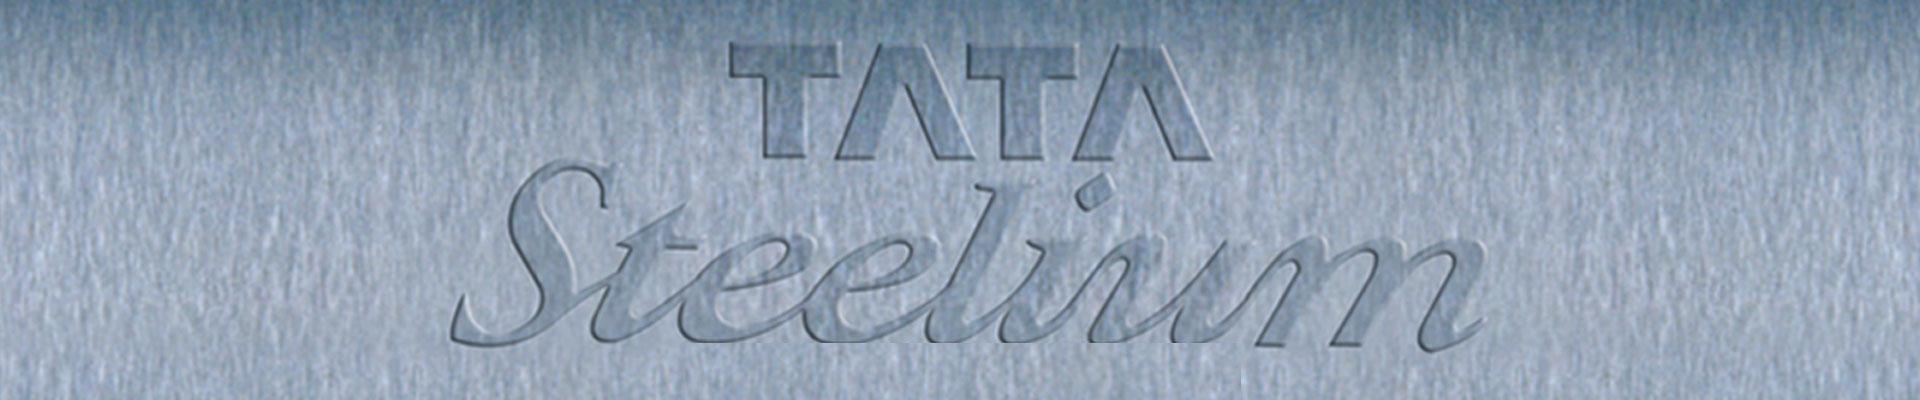 Tata Steelium